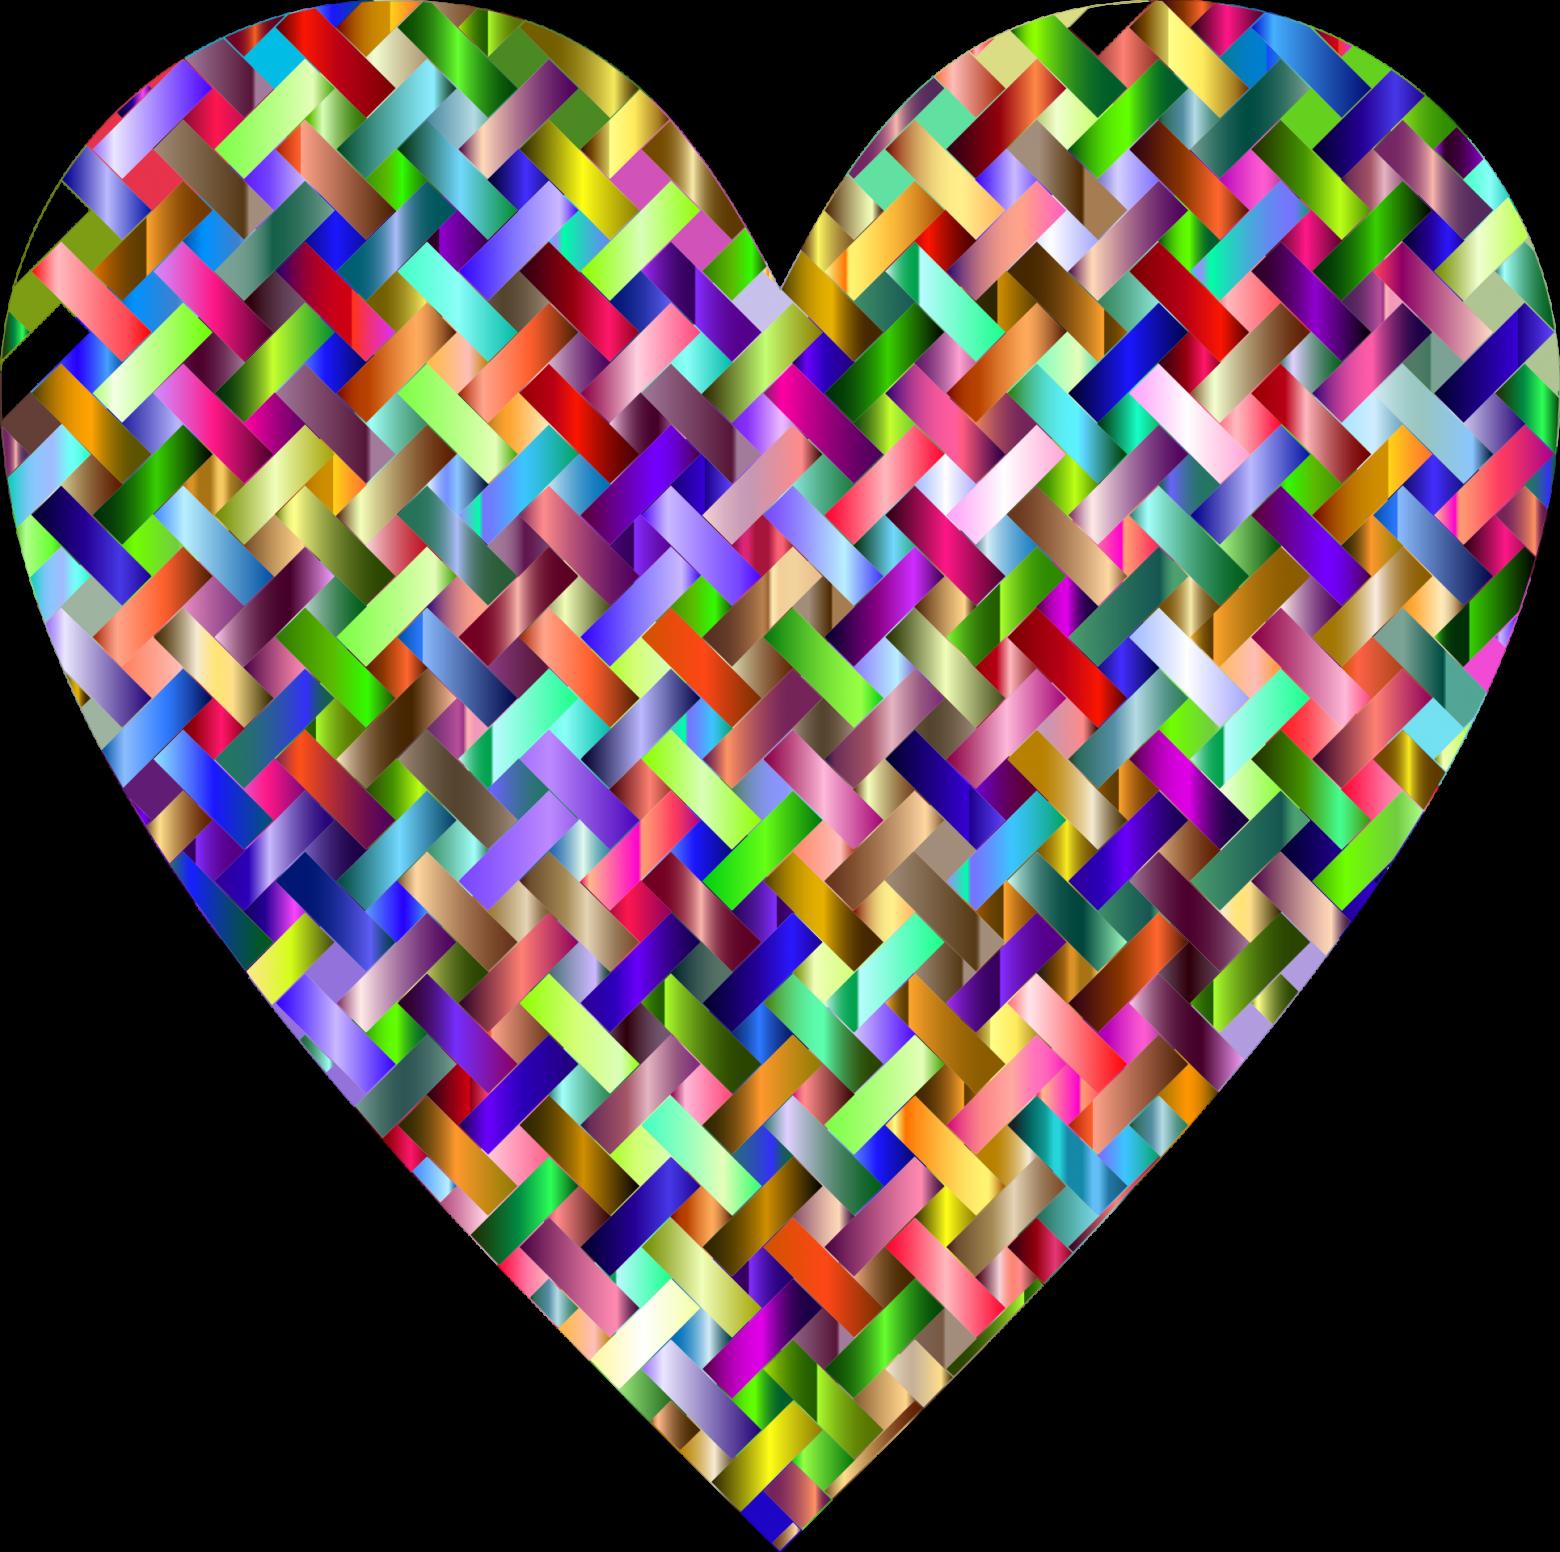 heart-1220657